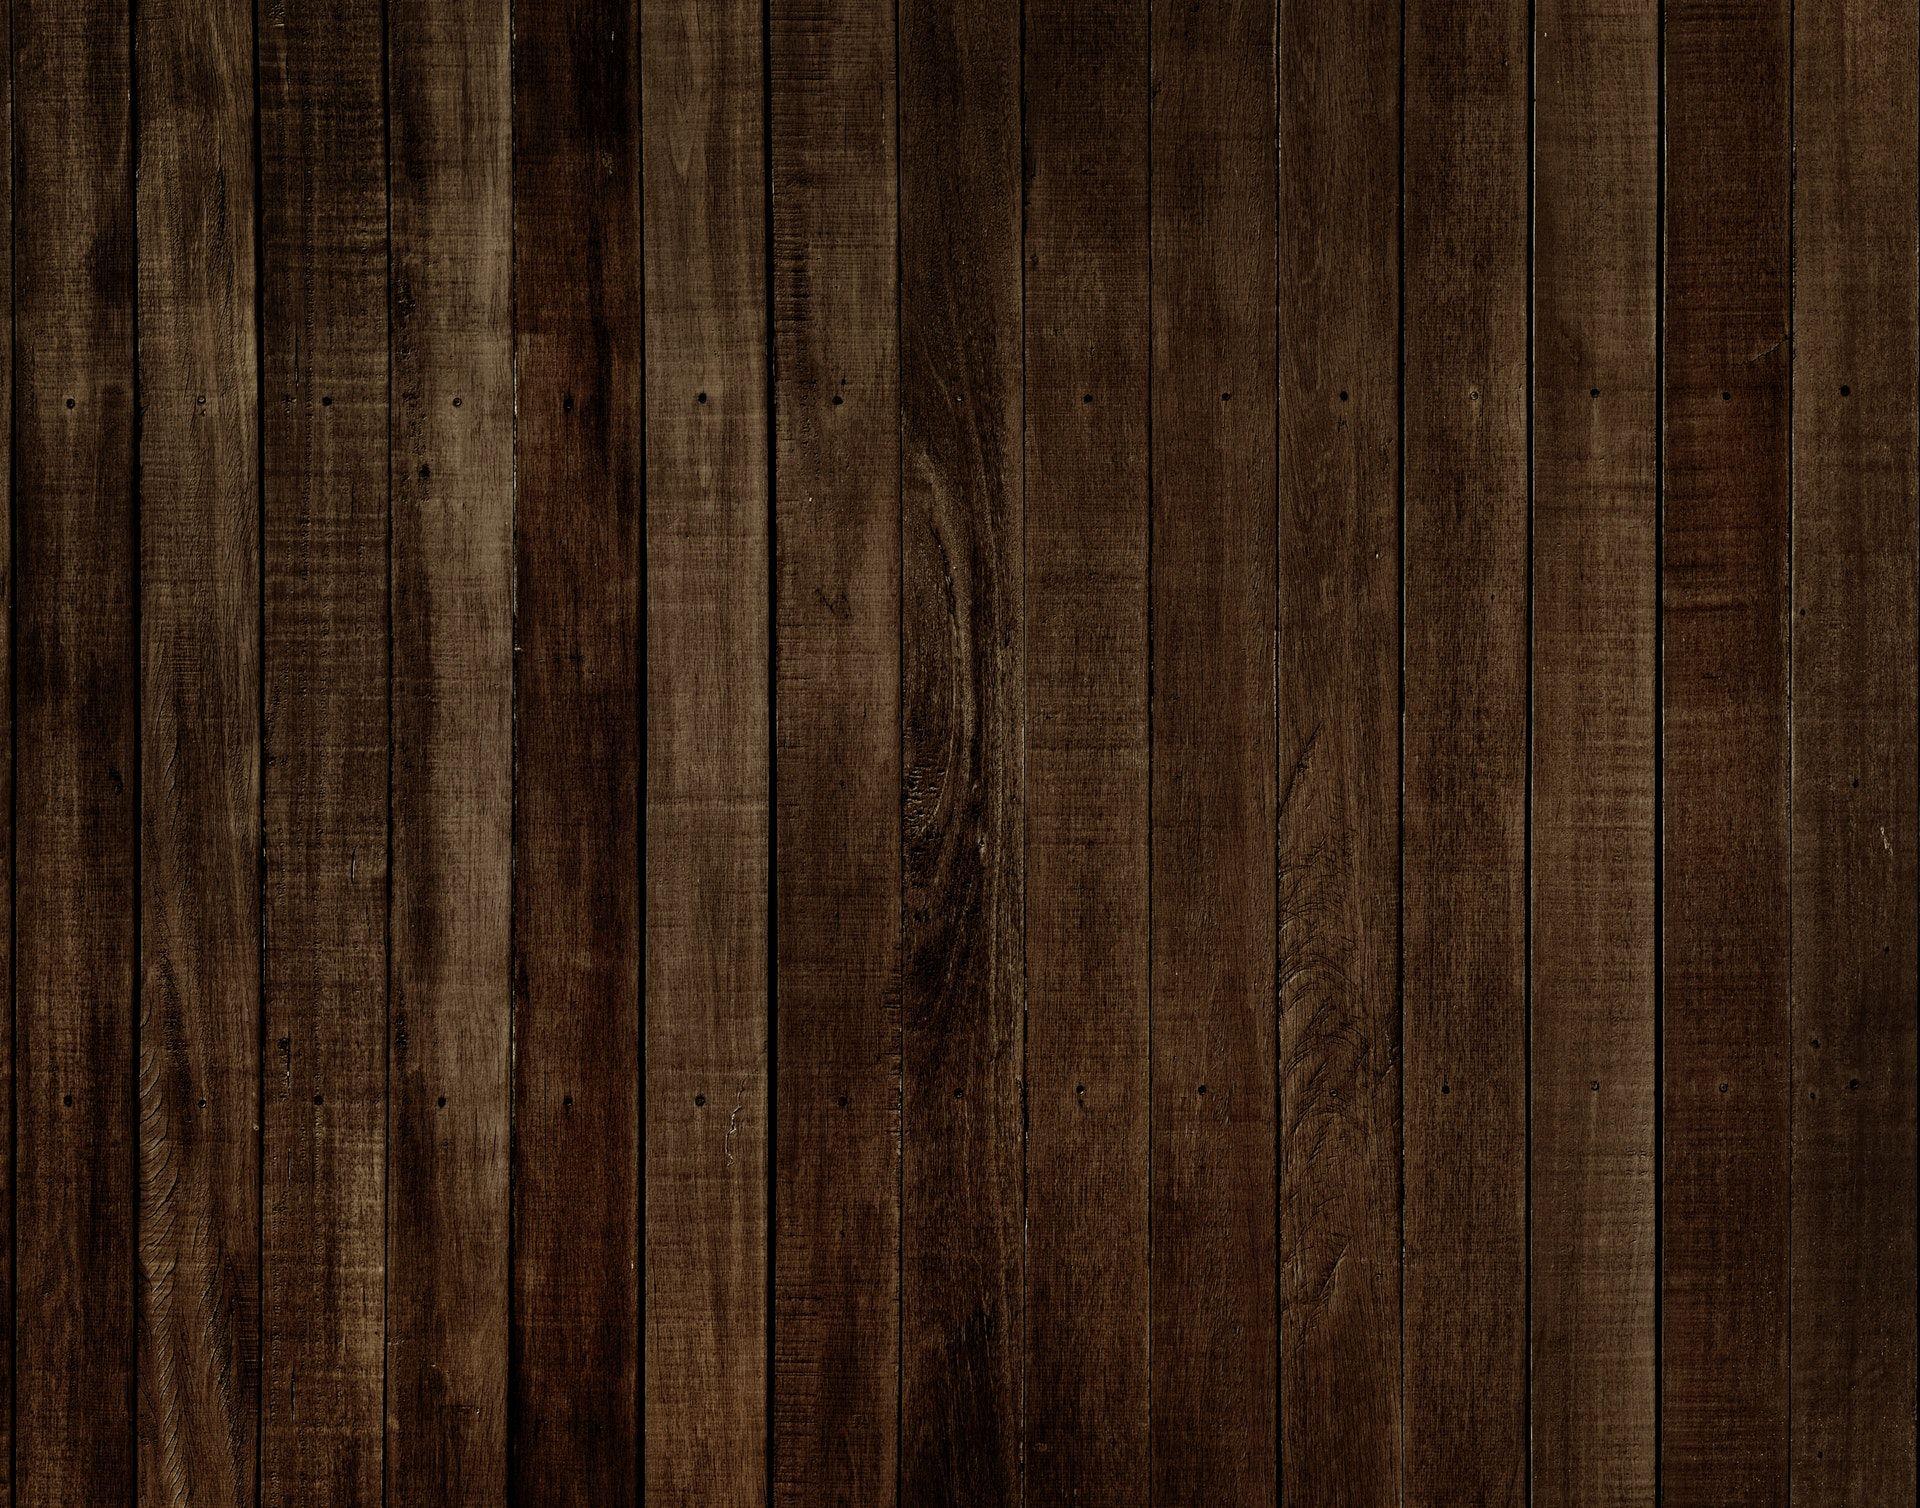 عکس زمینه پارکت چوبی قهوه ای پس زمینه